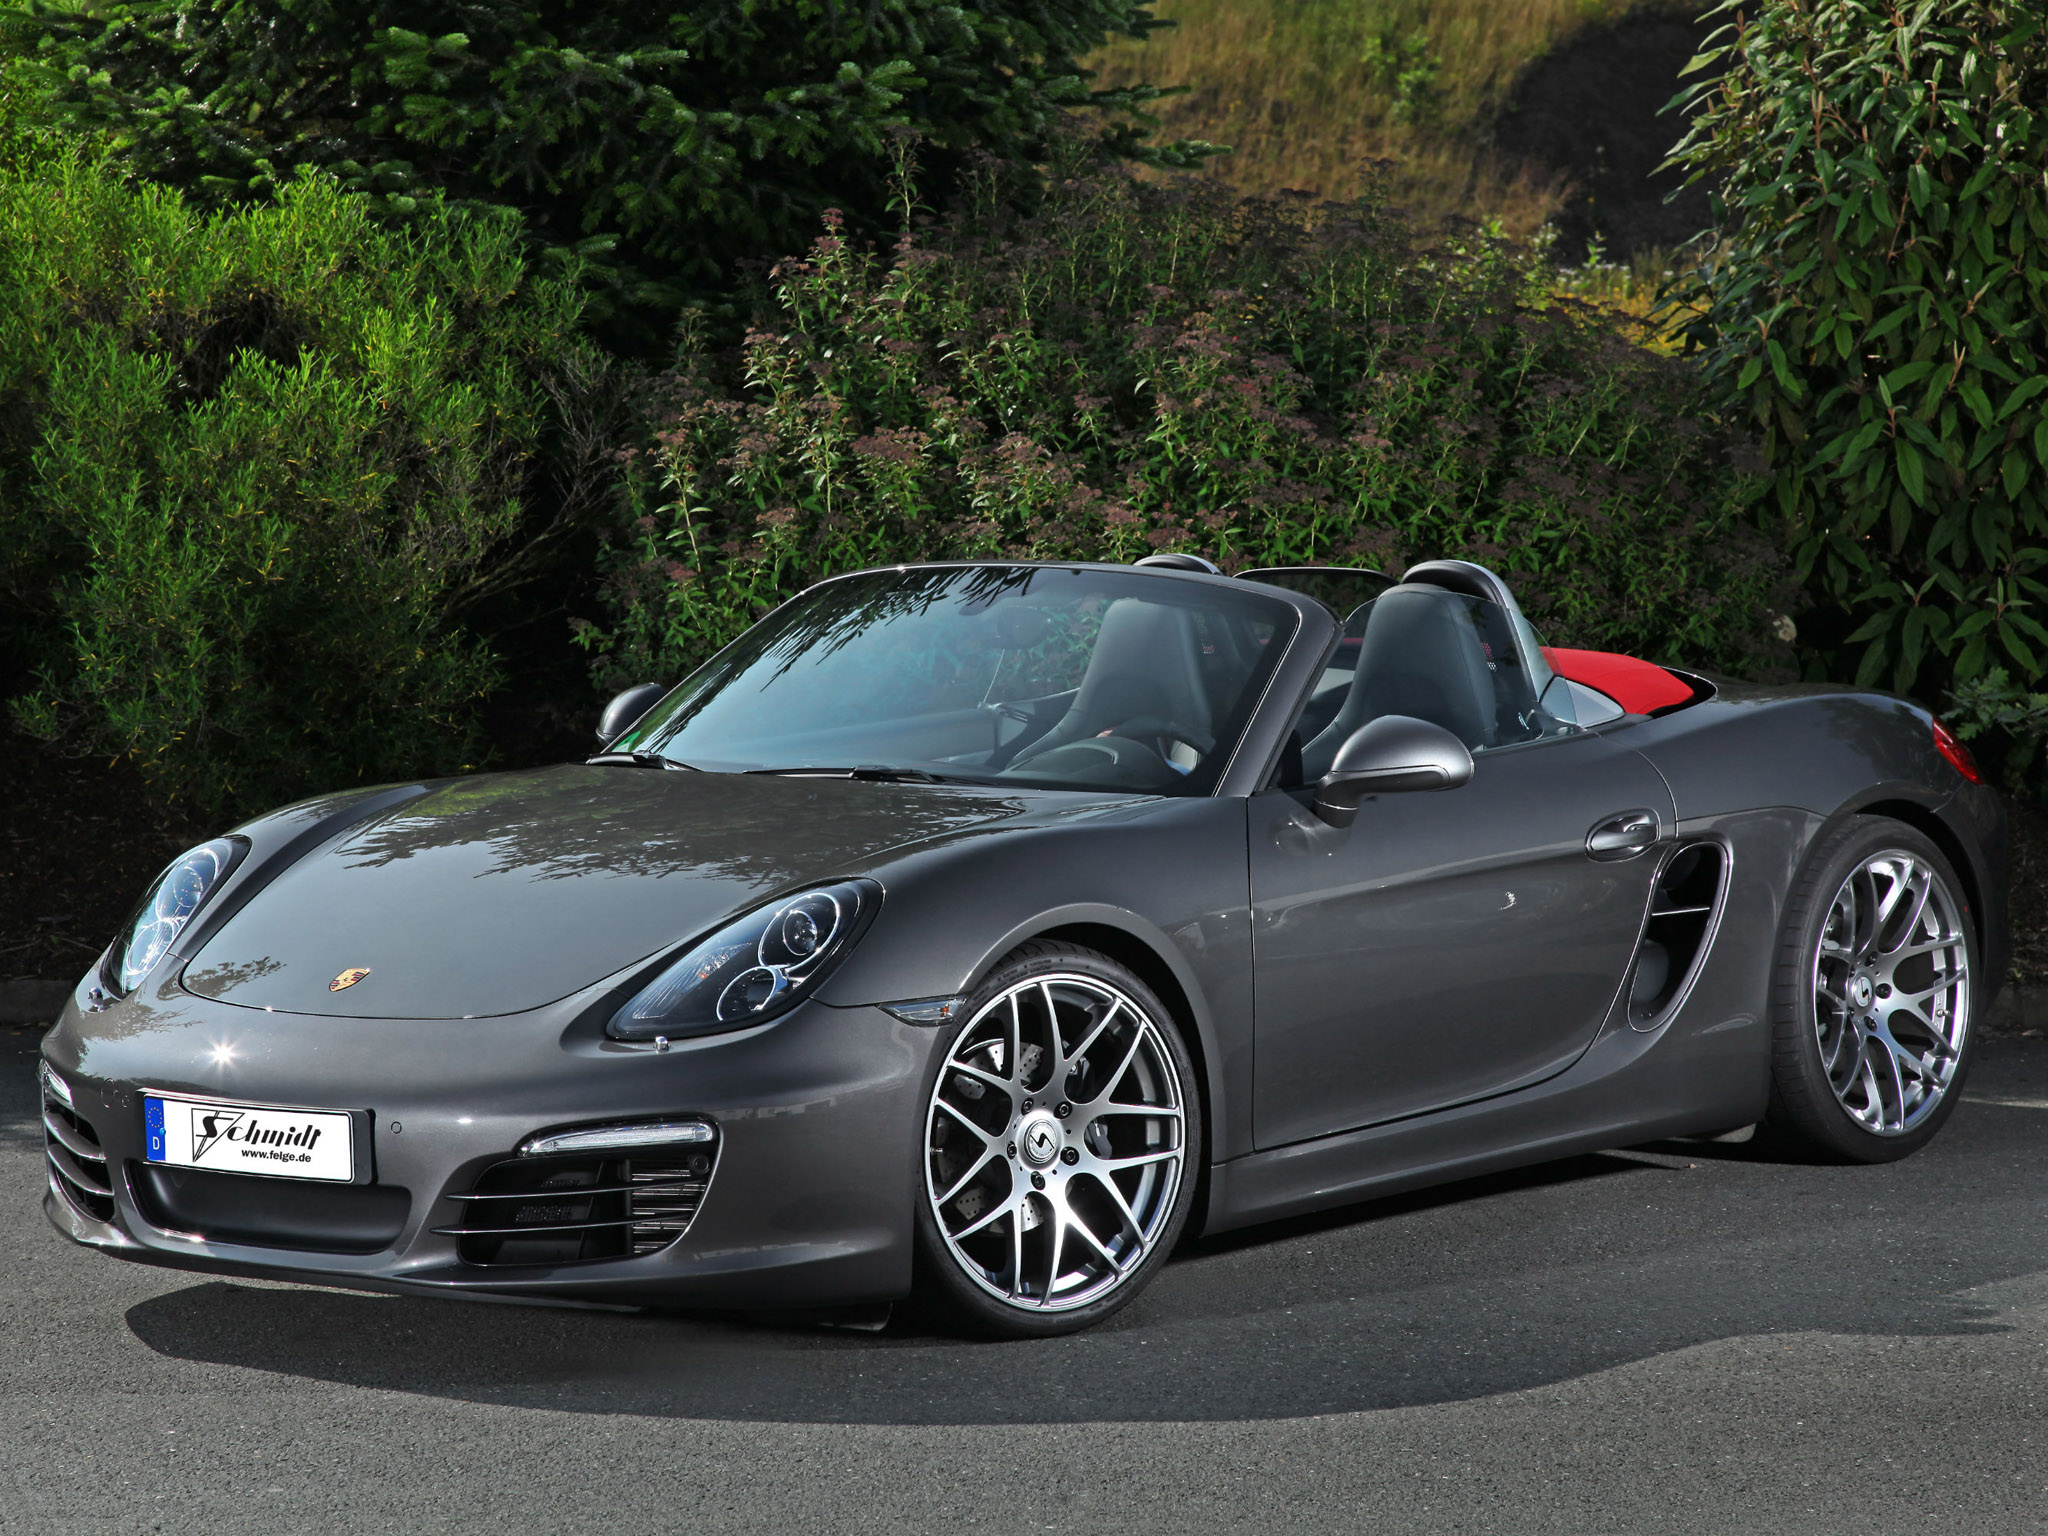 Schmidt Revolution Porsche - 2048x1536